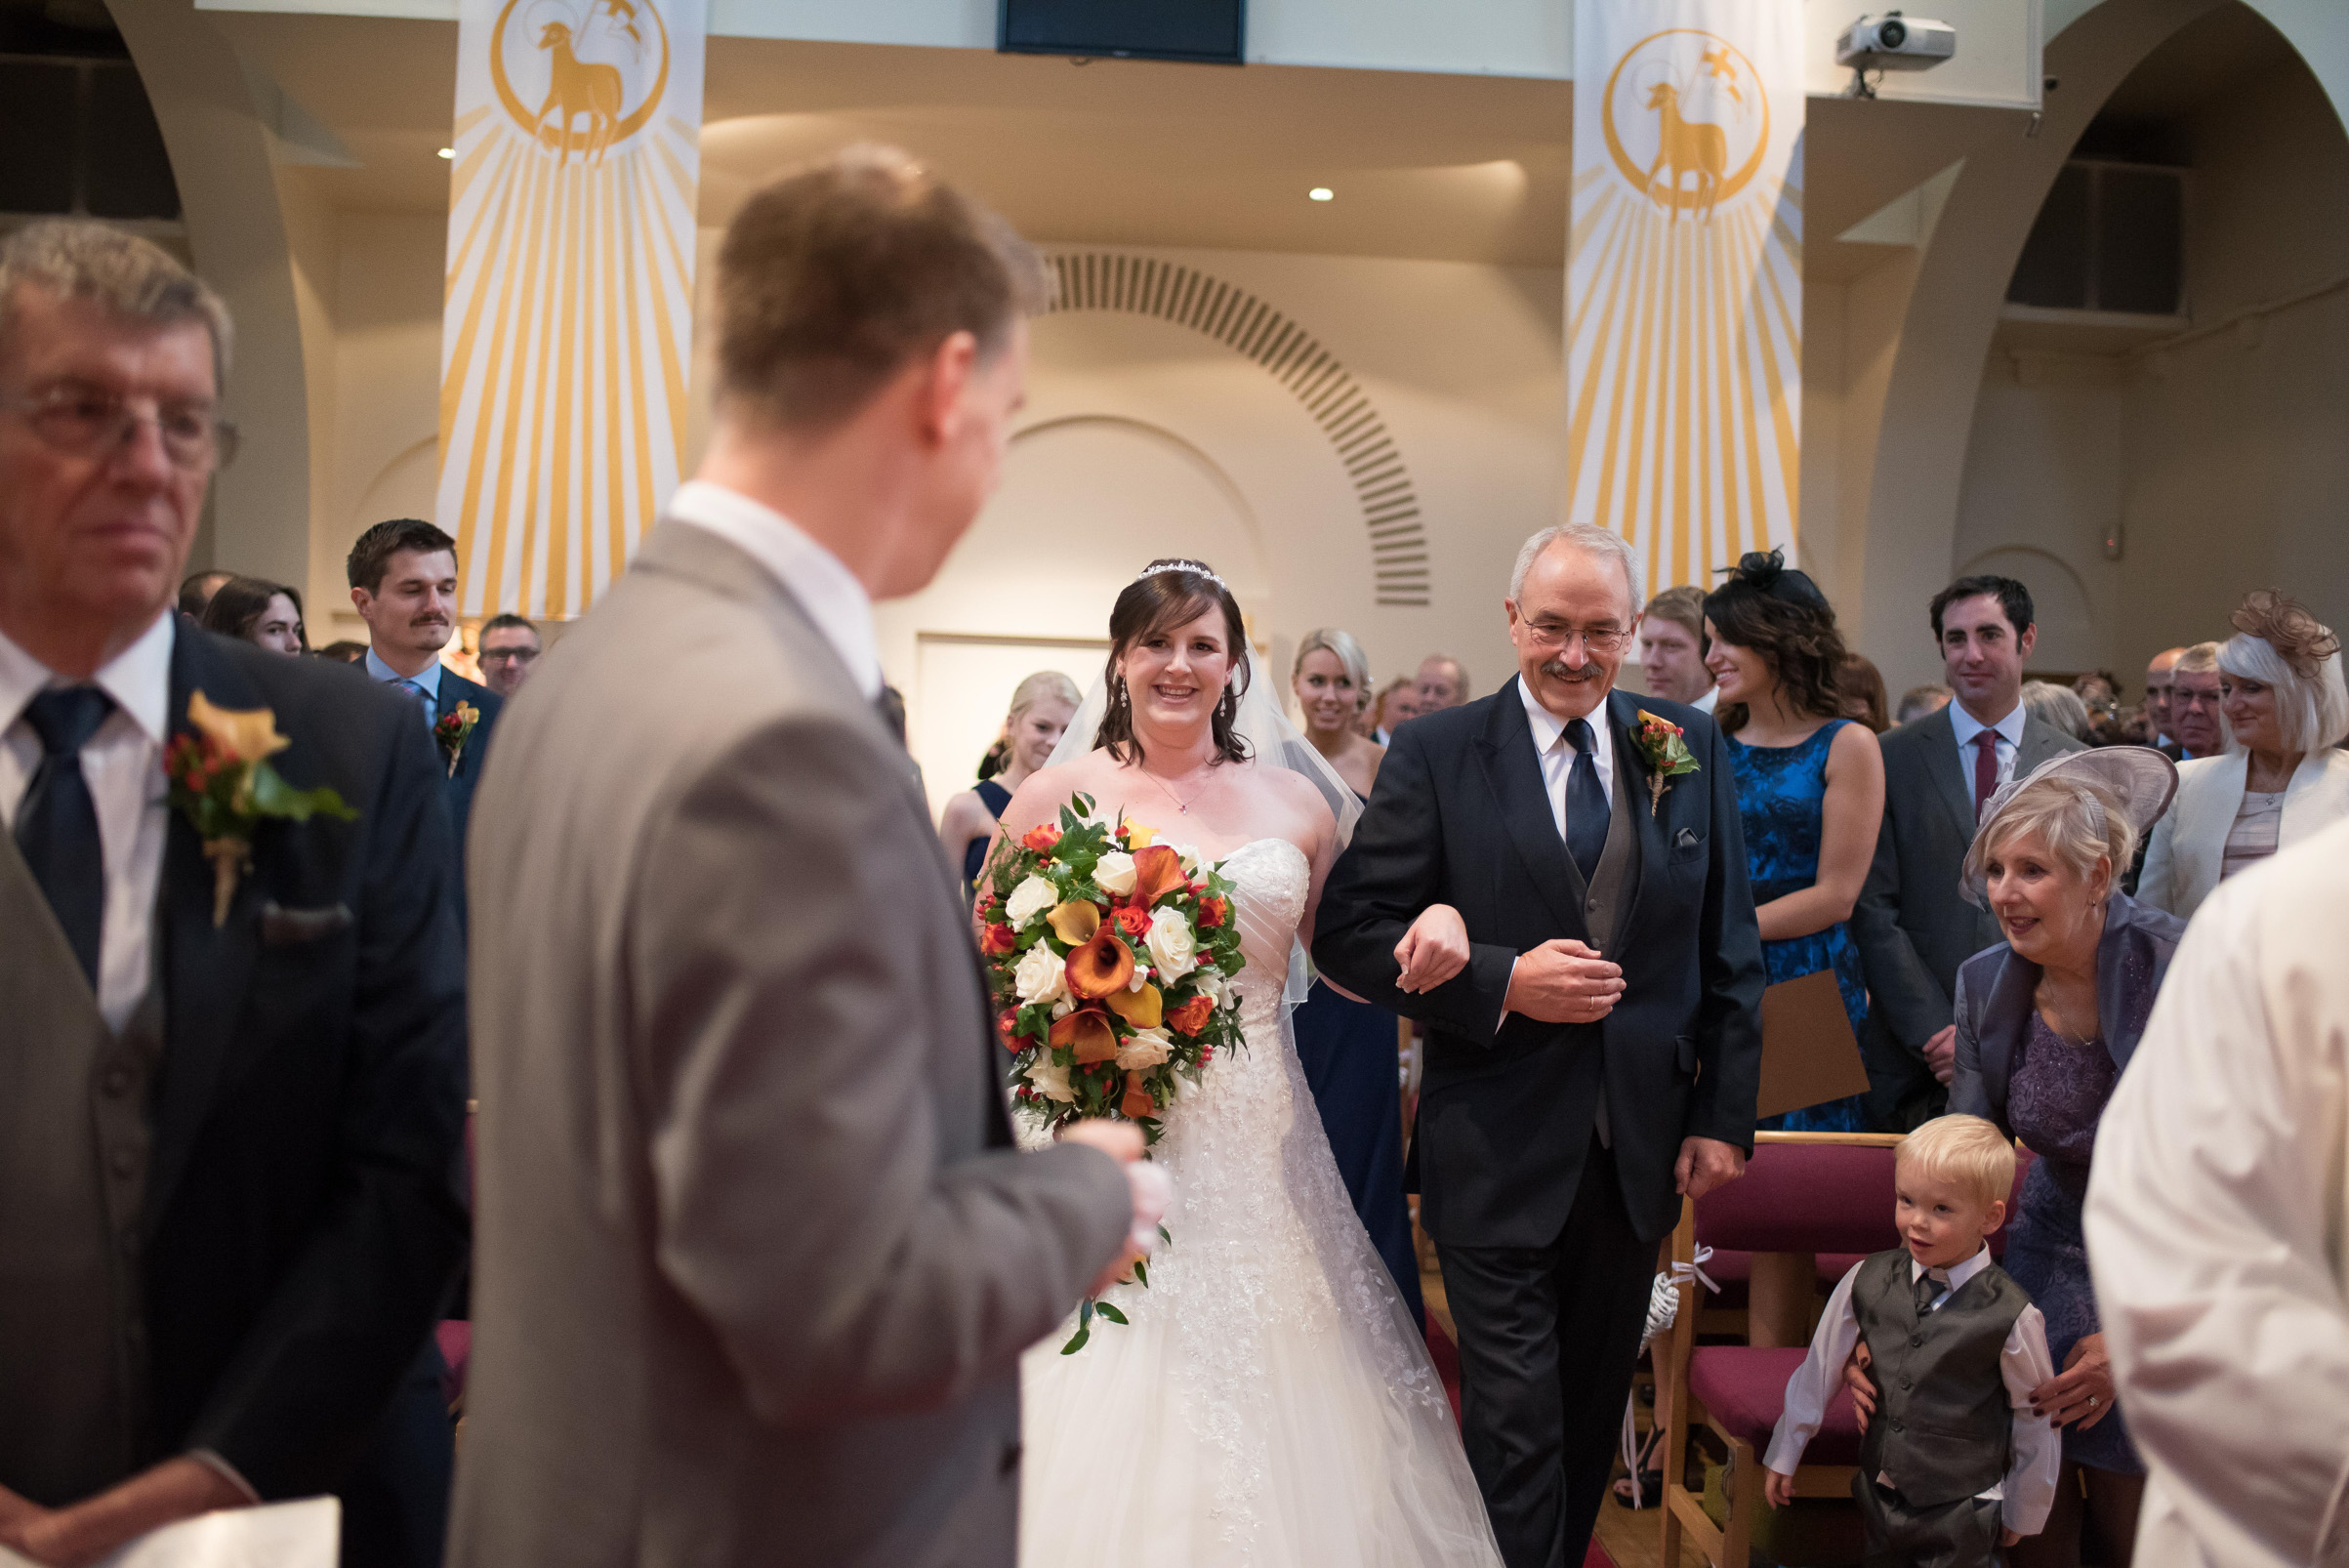 The+Fairlawns+wedding+Aldridge+StLukes+Church-80.jpg